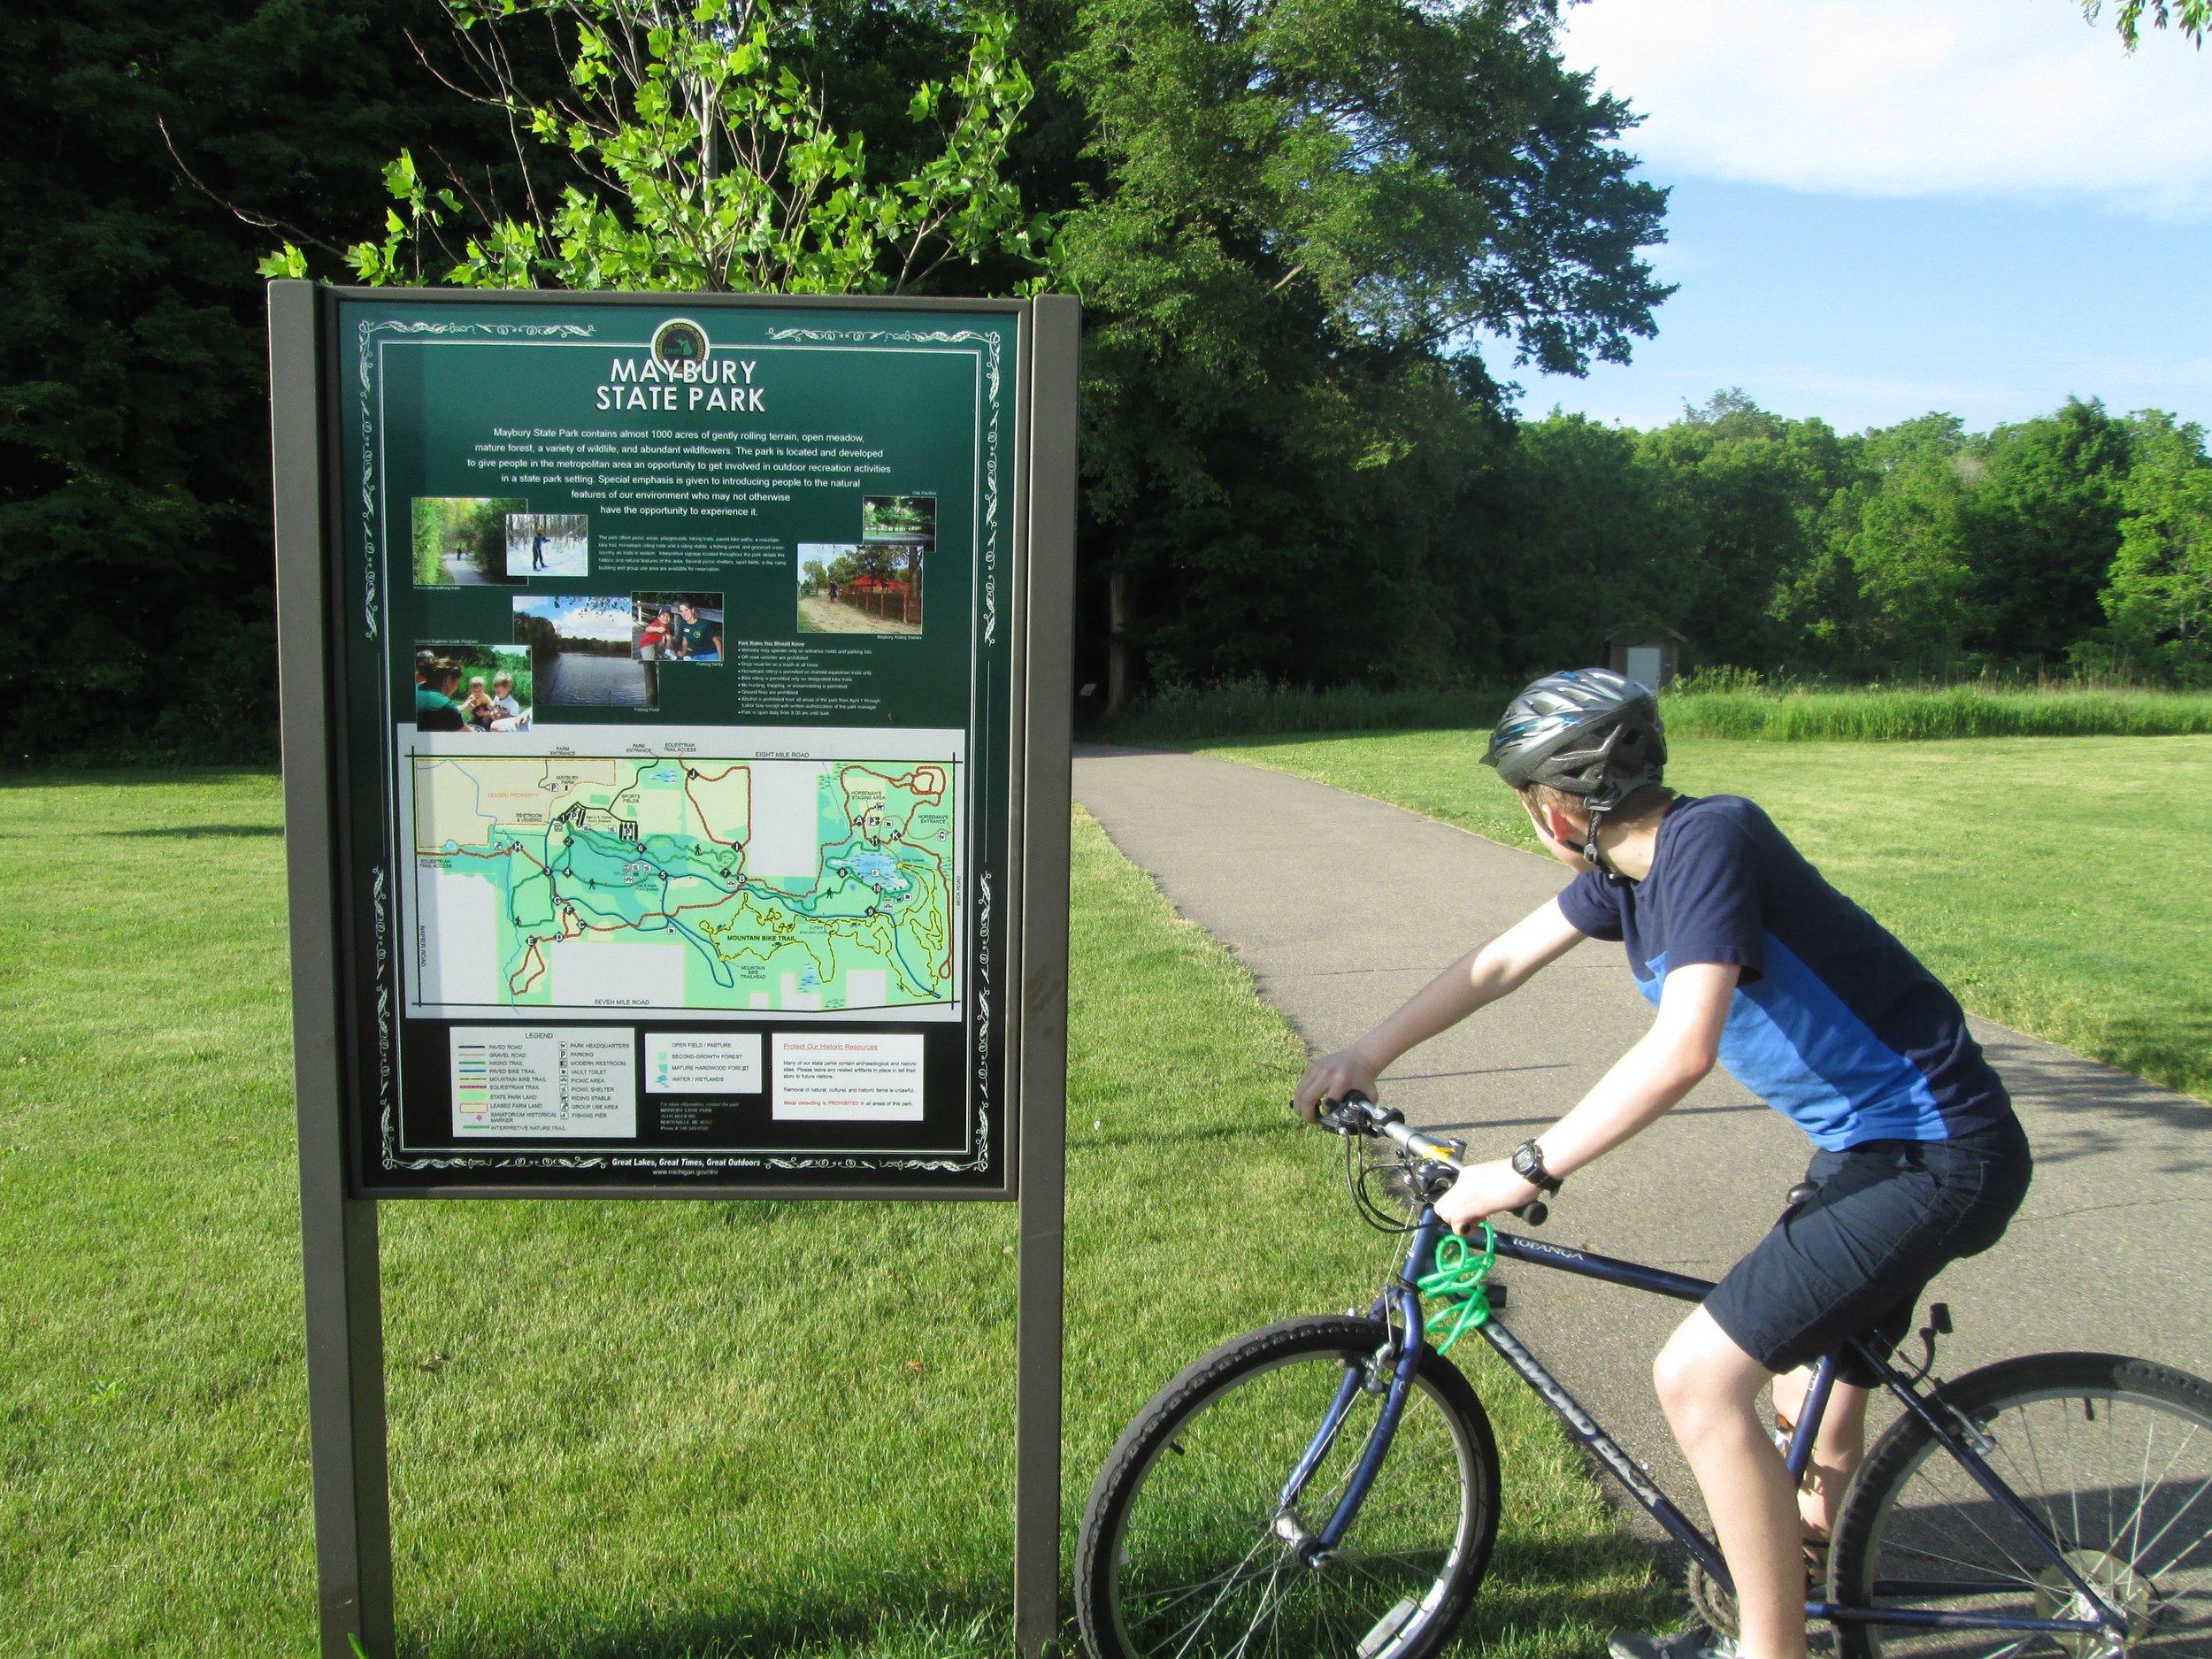 Biking at Maybury State Park in Northville